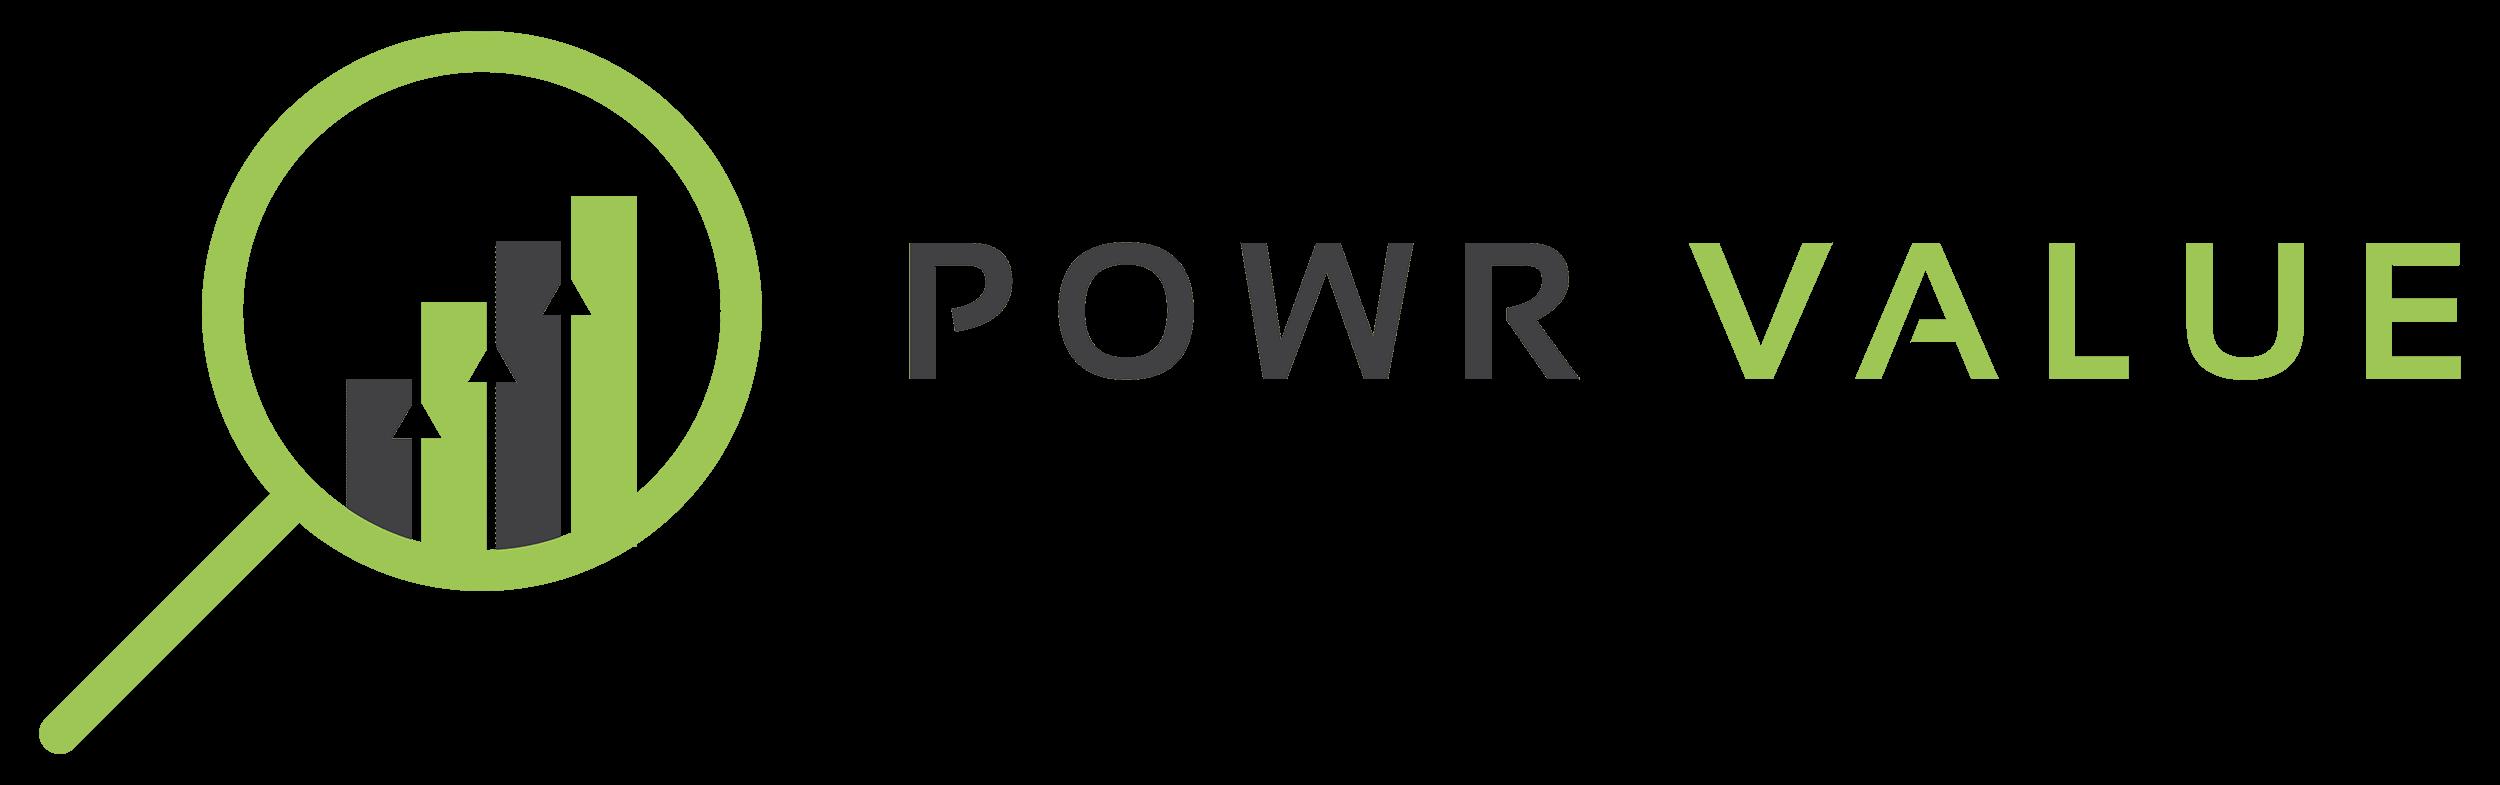 POWR Value